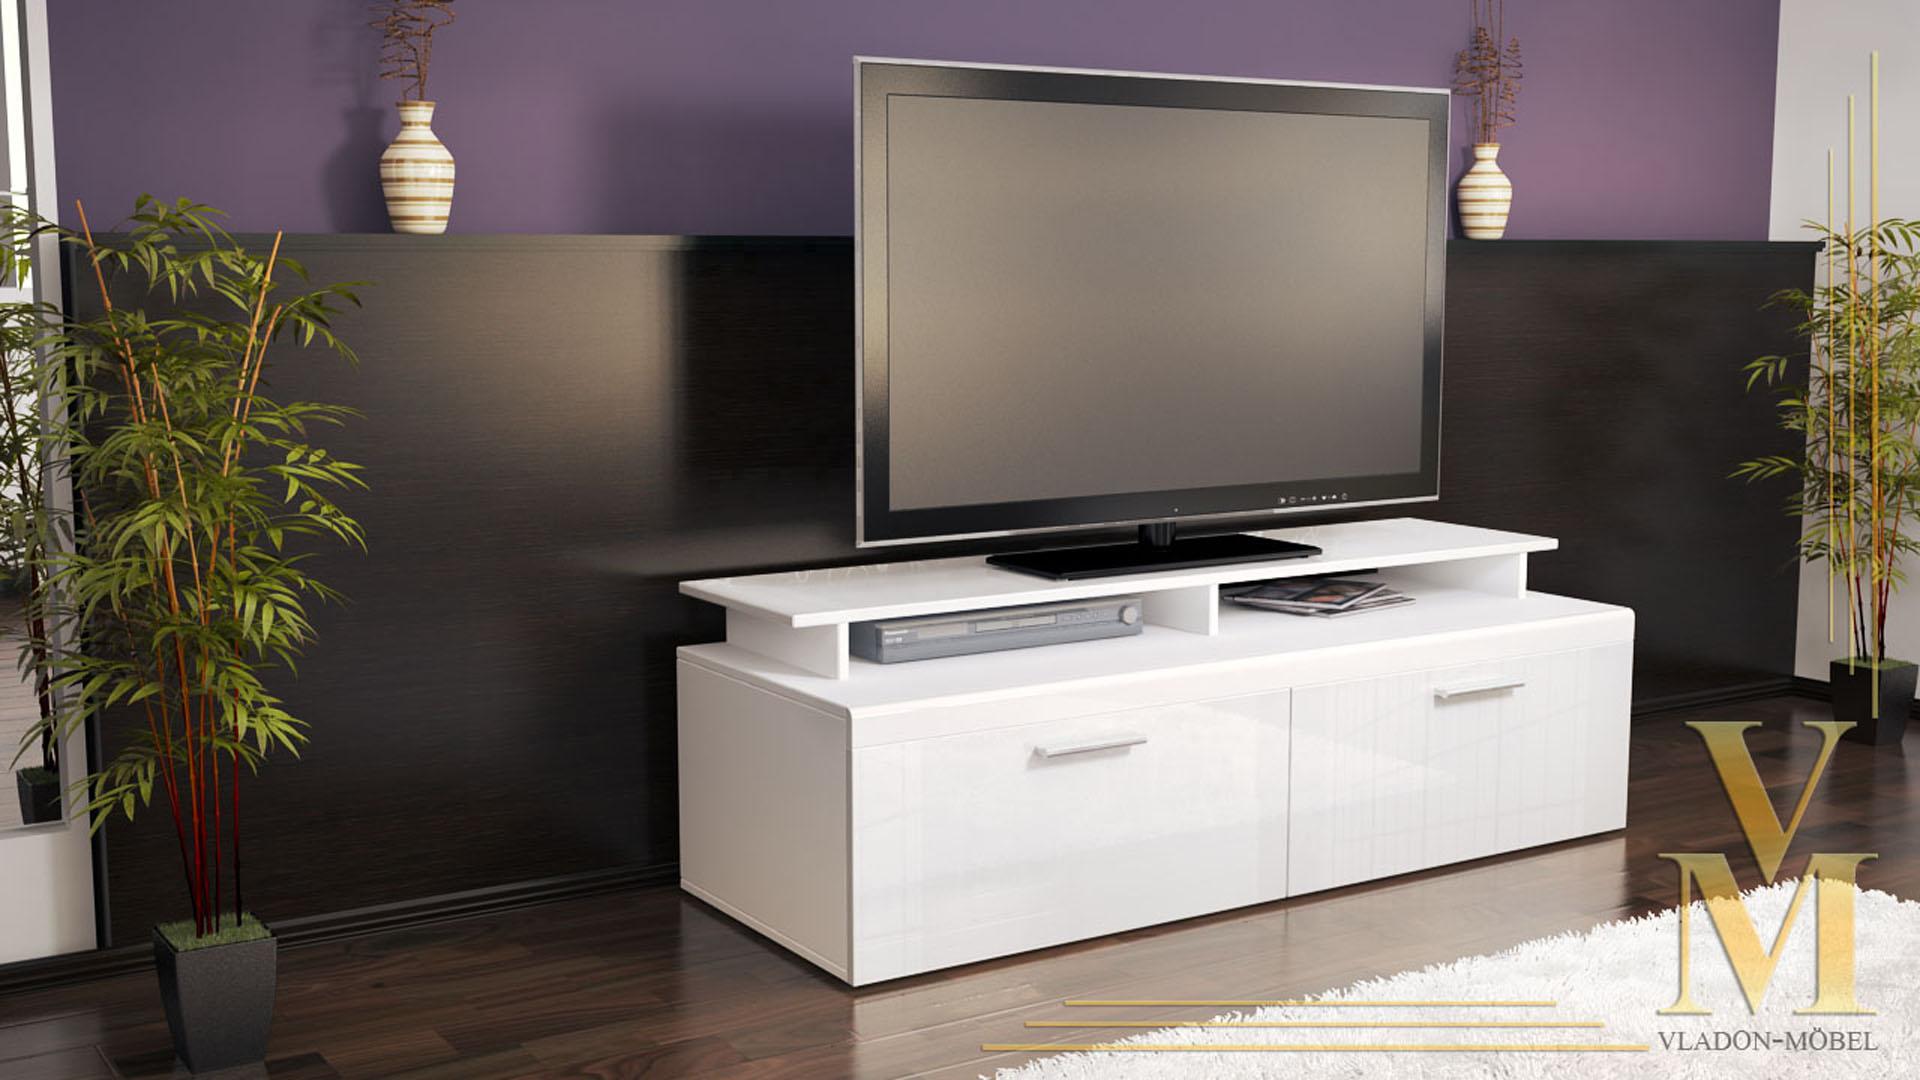 tv board lowboard sideboard tisch atlanta wei hochglanz naturt ne ebay. Black Bedroom Furniture Sets. Home Design Ideas